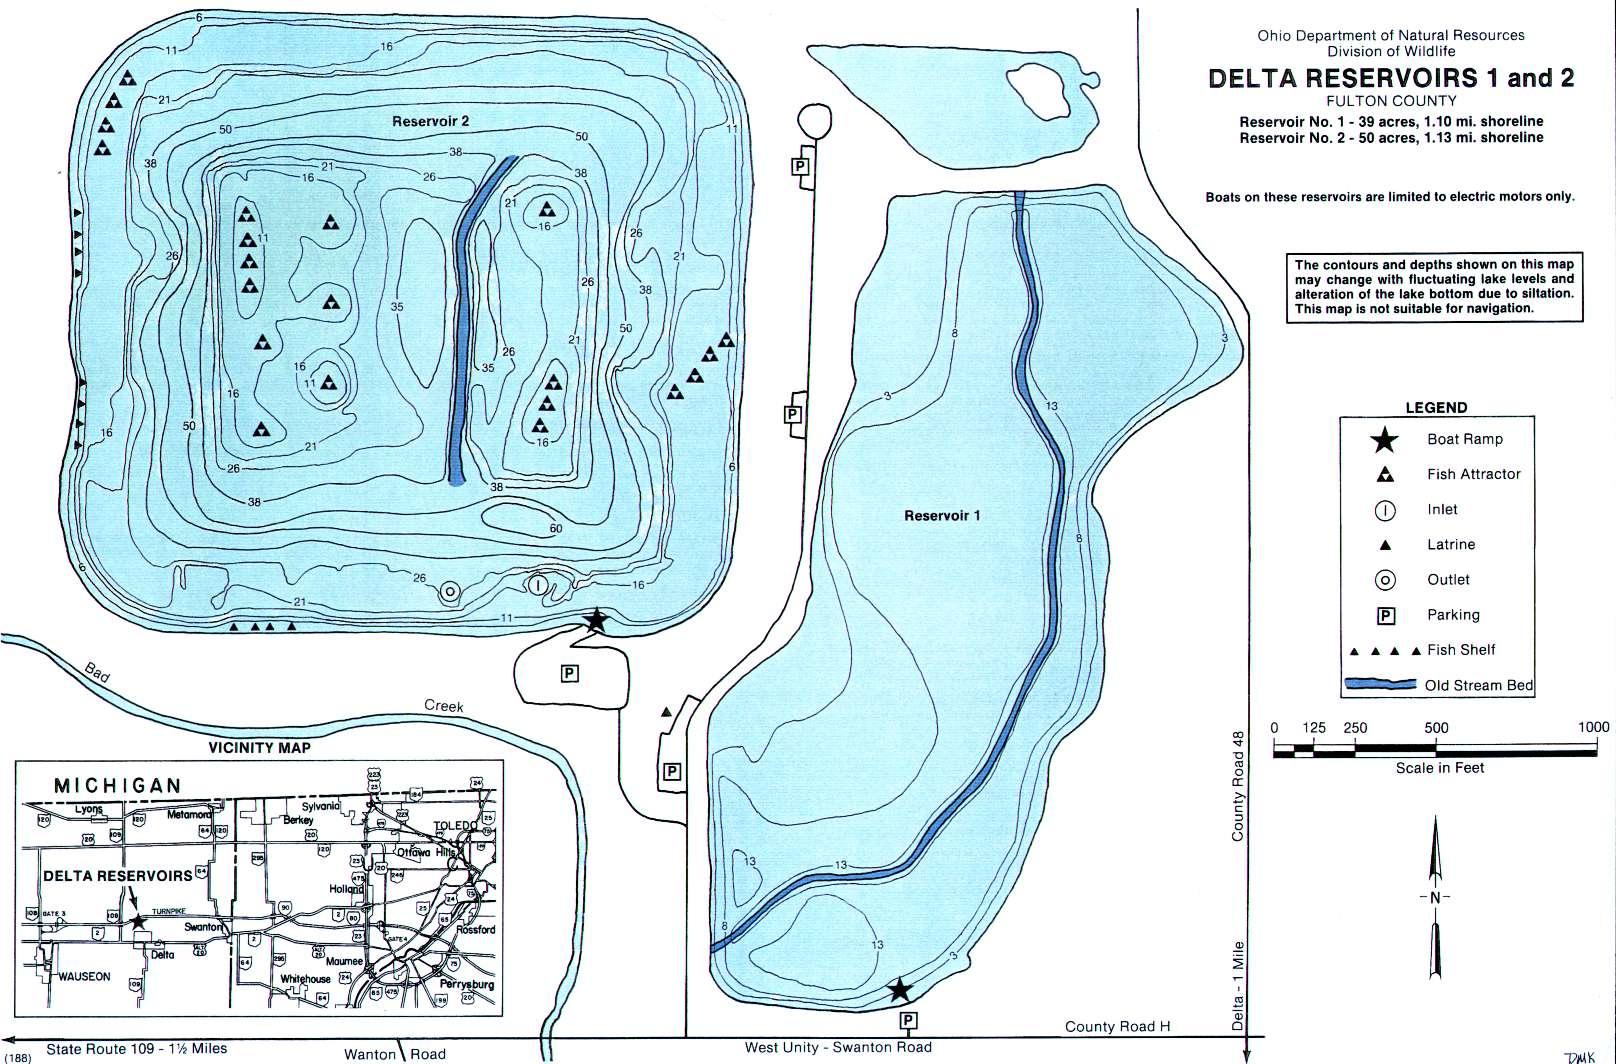 Delta Reservoir 1 & 2 - GoFishOhio